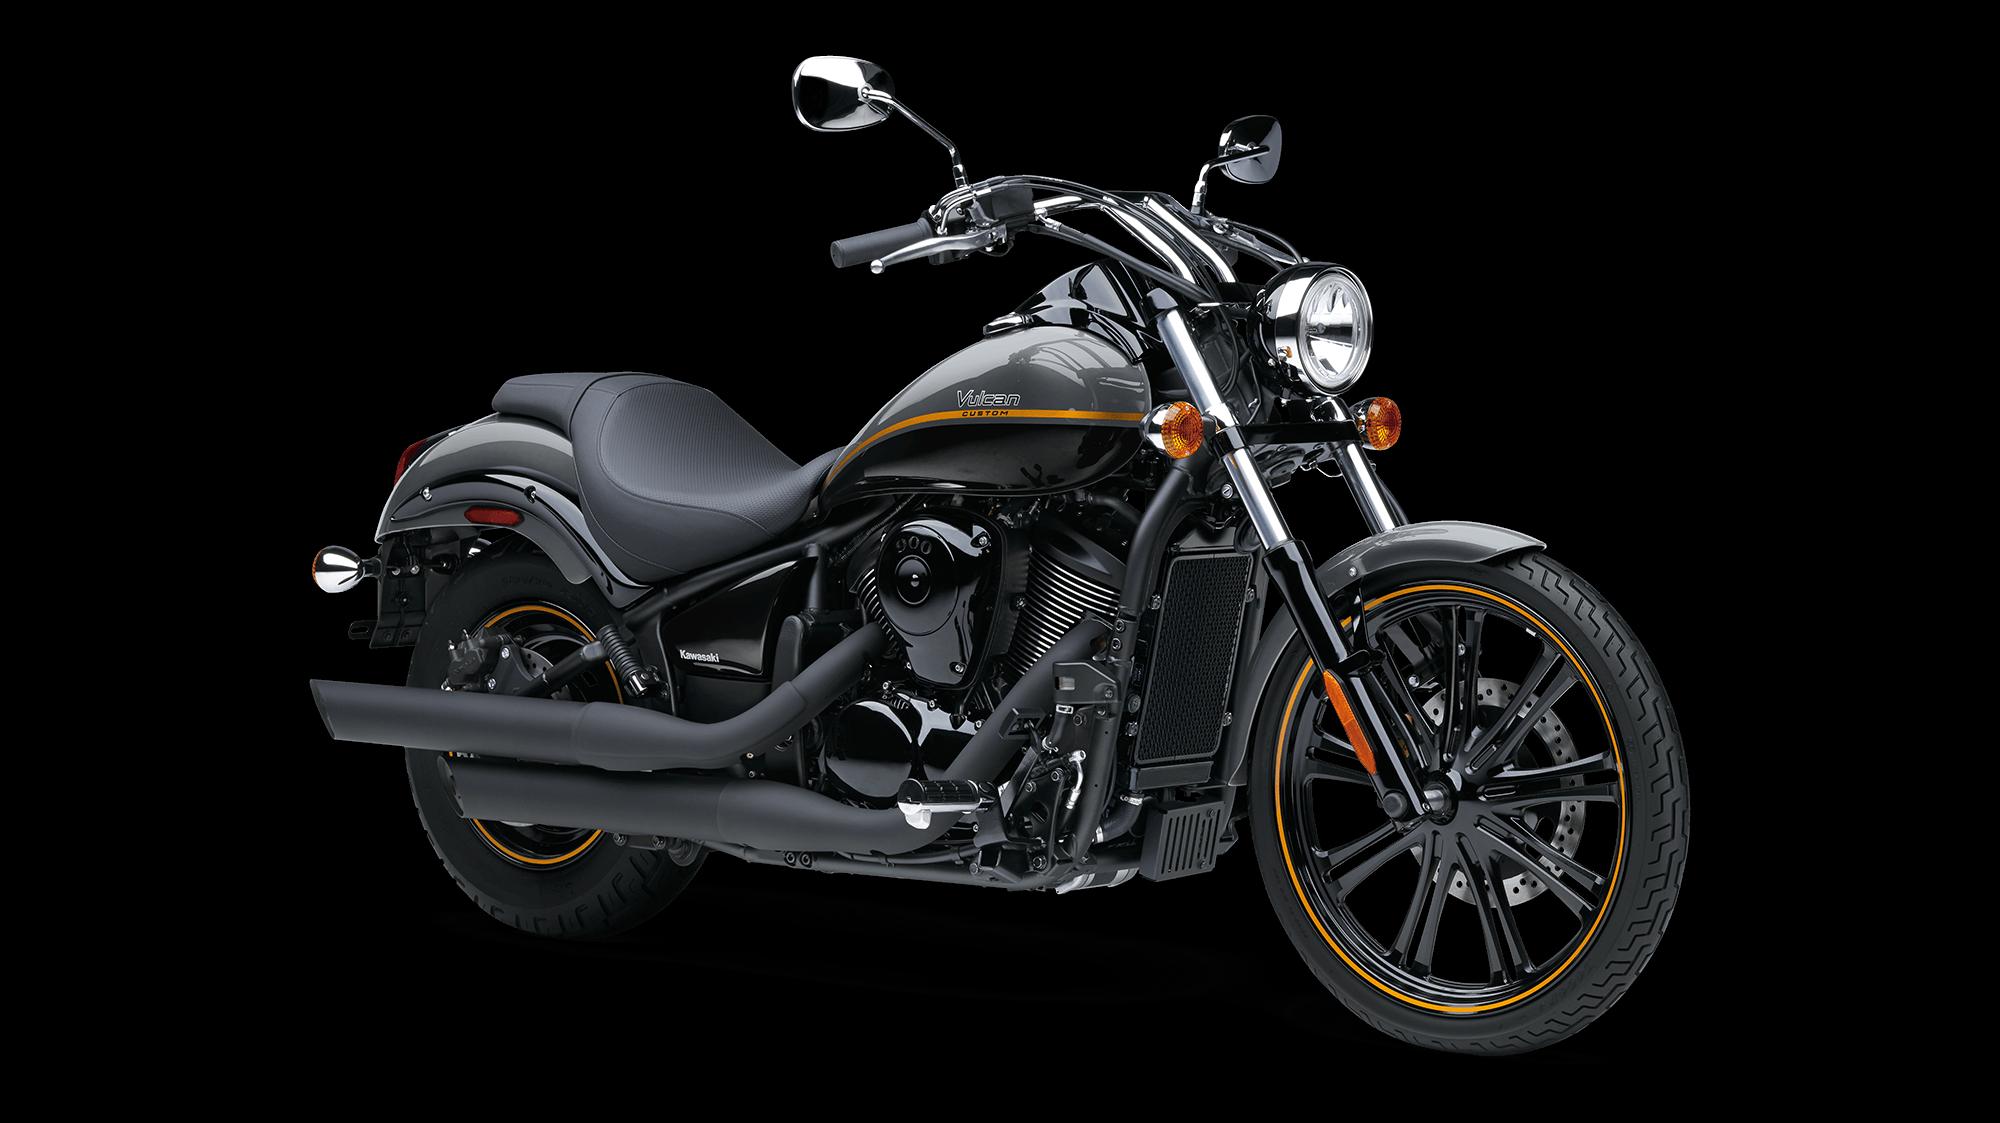 2019 Vulcan 900 Custom Vulcan Motorcycle By Kawasaki